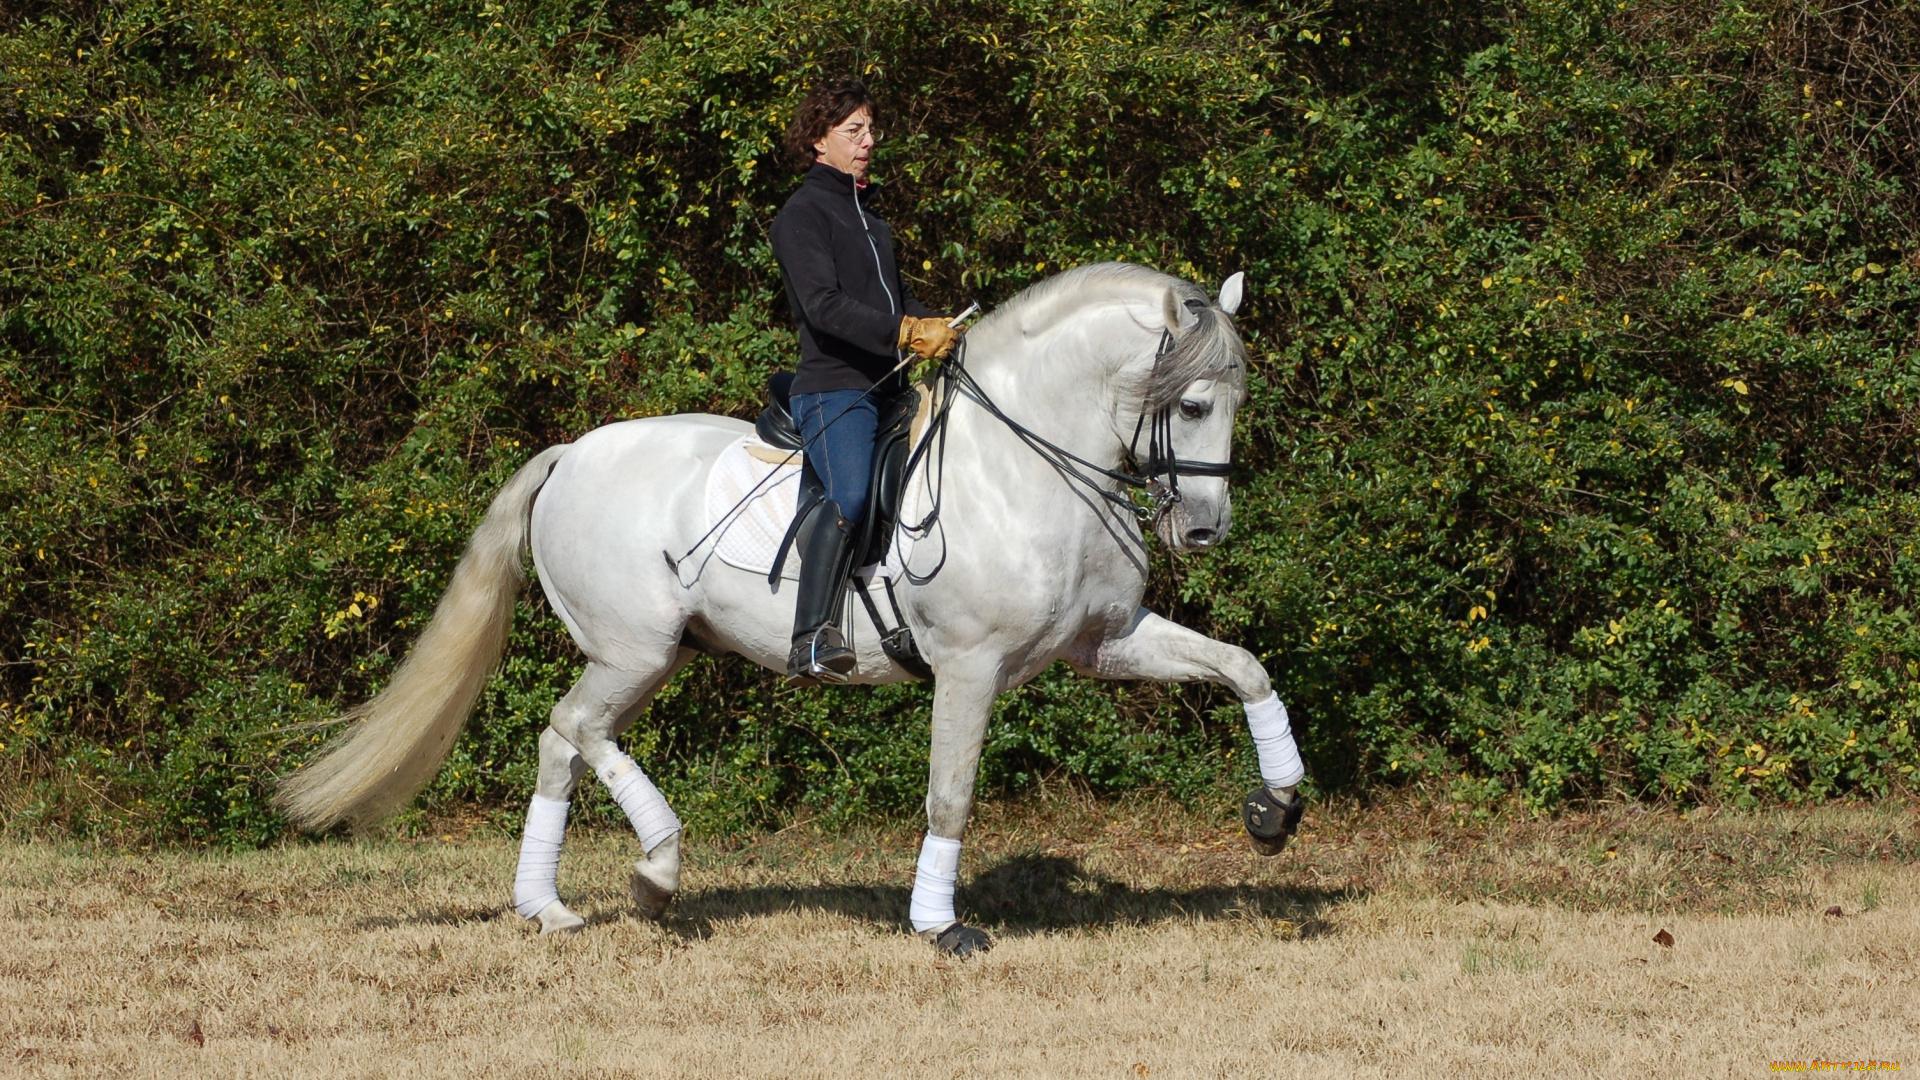 Картинки с всадником на лошади